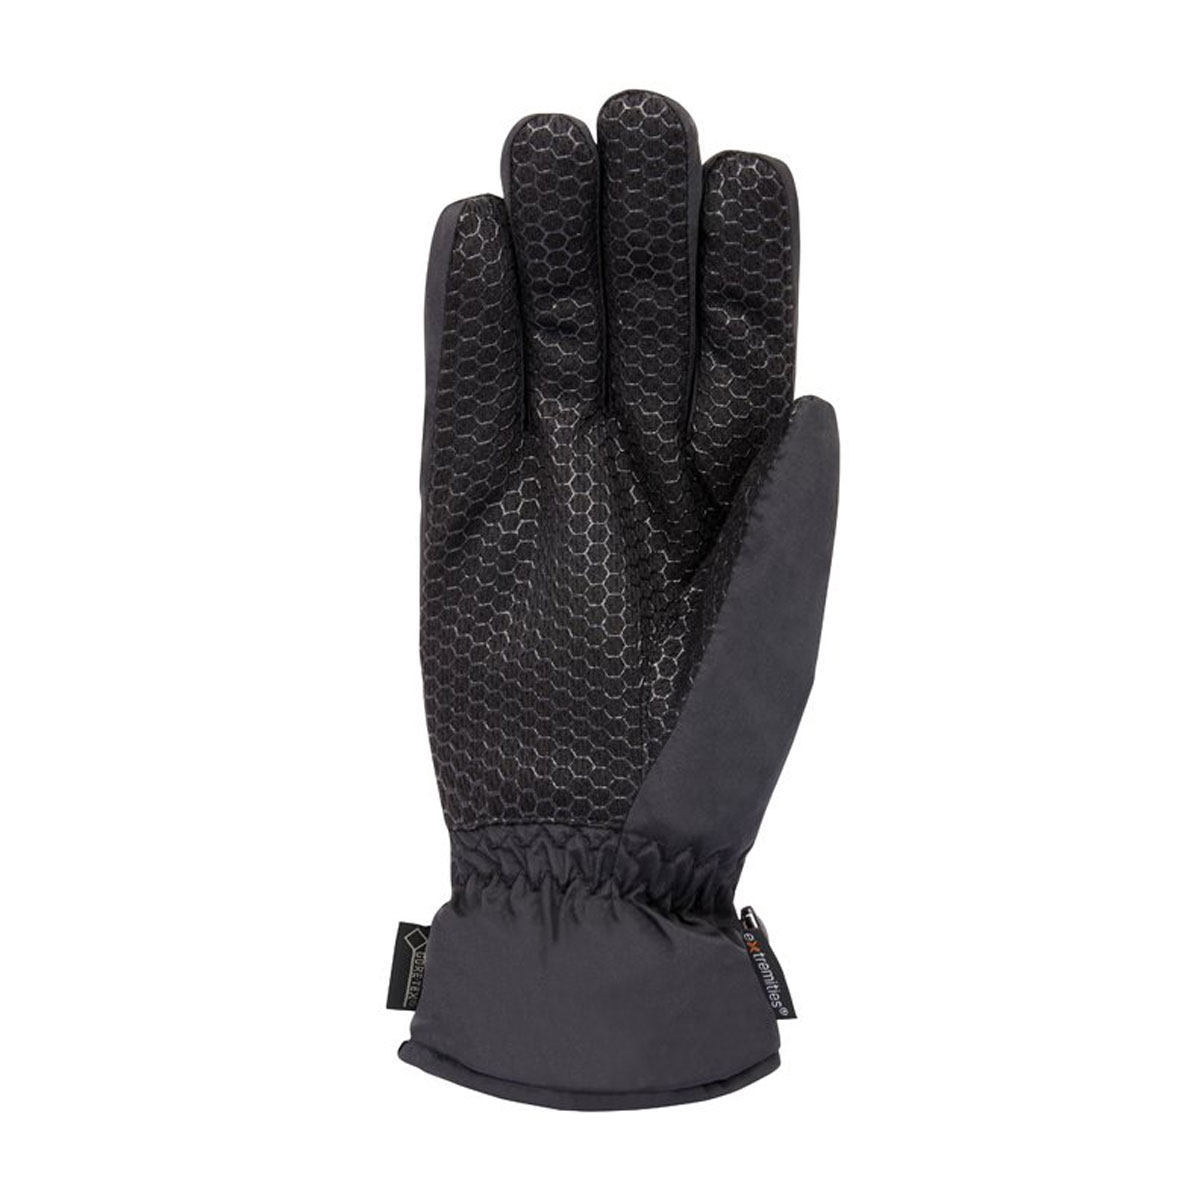 Extremities Vapor Glove GTX - Black | Uttings.co.uk